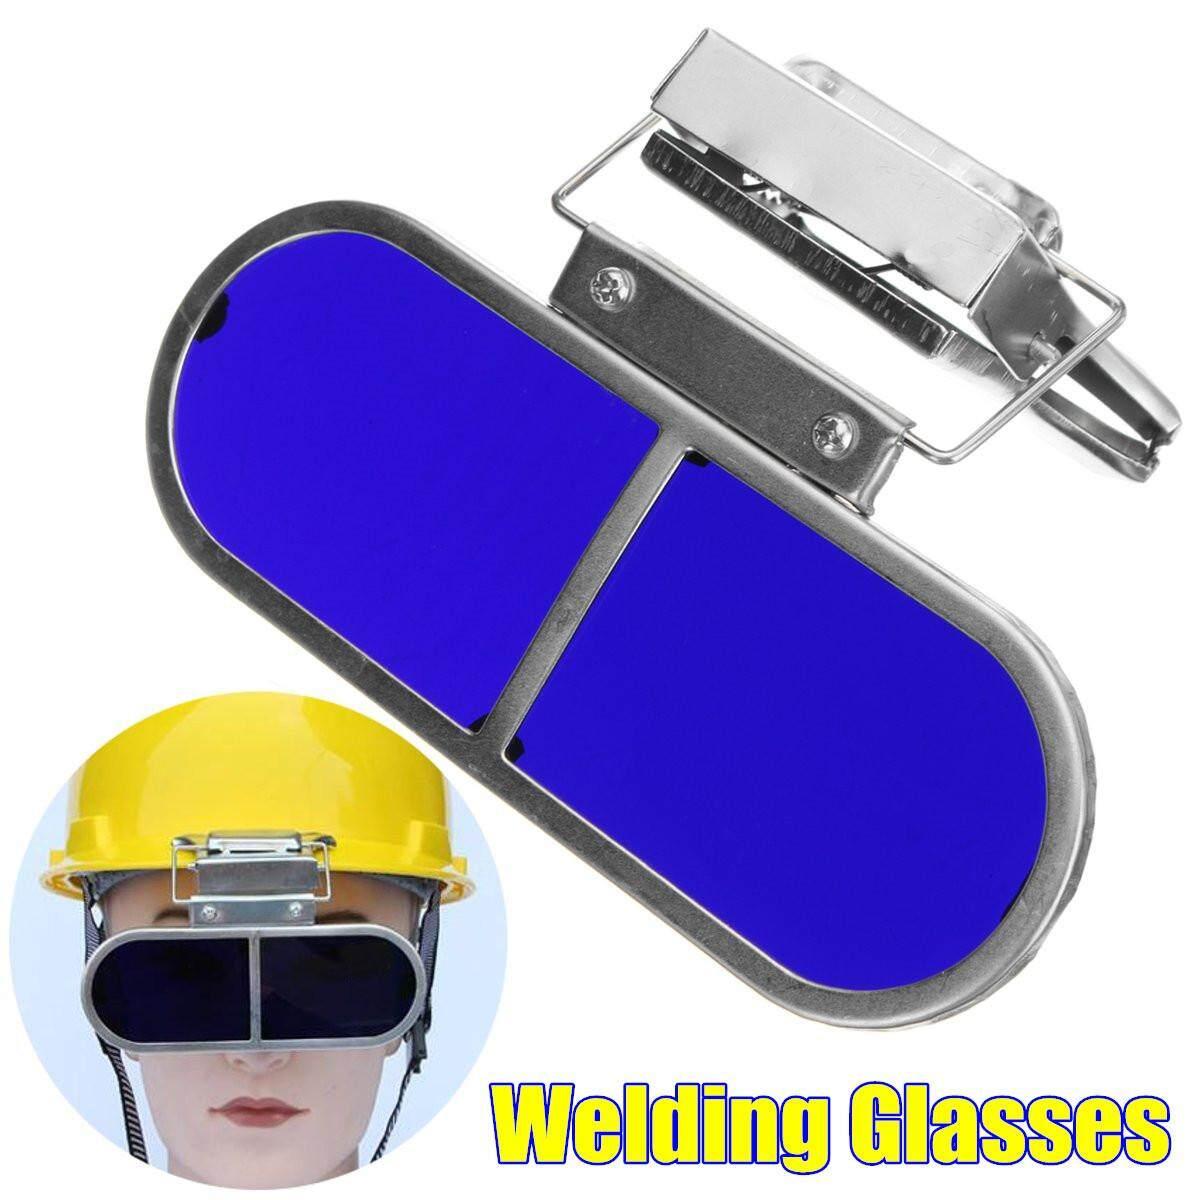 Welding Kacamata Perlindungan Pembuatan Baja Kacamata Olahraga Bingkai Anti Karat dengan Klip-Internasional